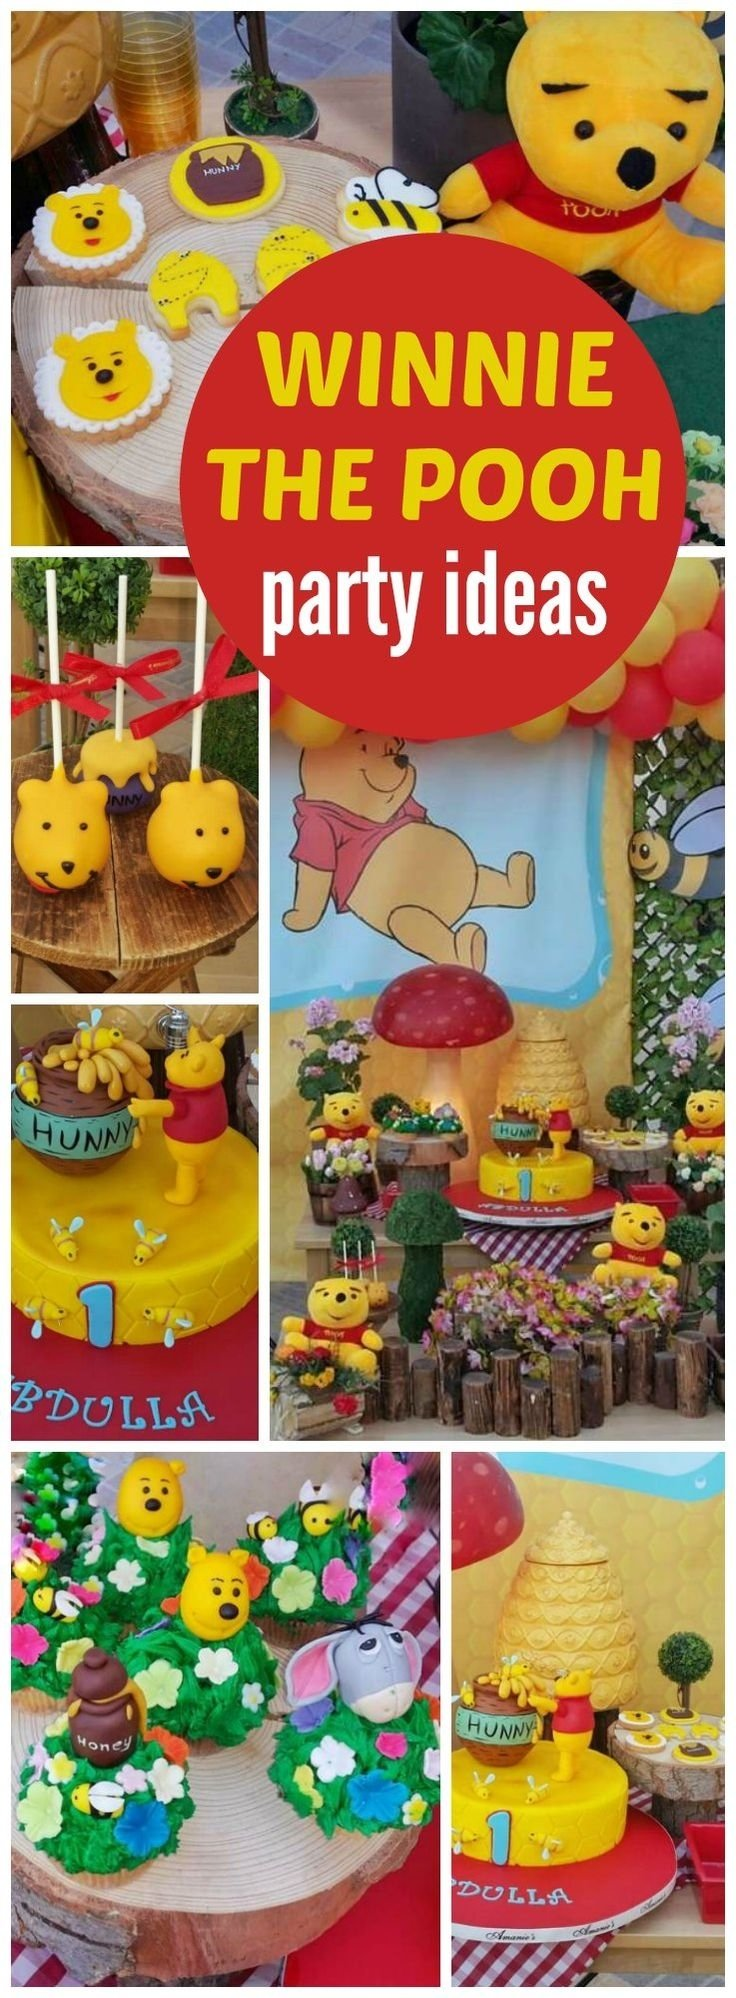 10 Pretty Winnie The Pooh Birthday Party Ideas 94 best winnie the pooh party ideas images on pinterest pooh bear